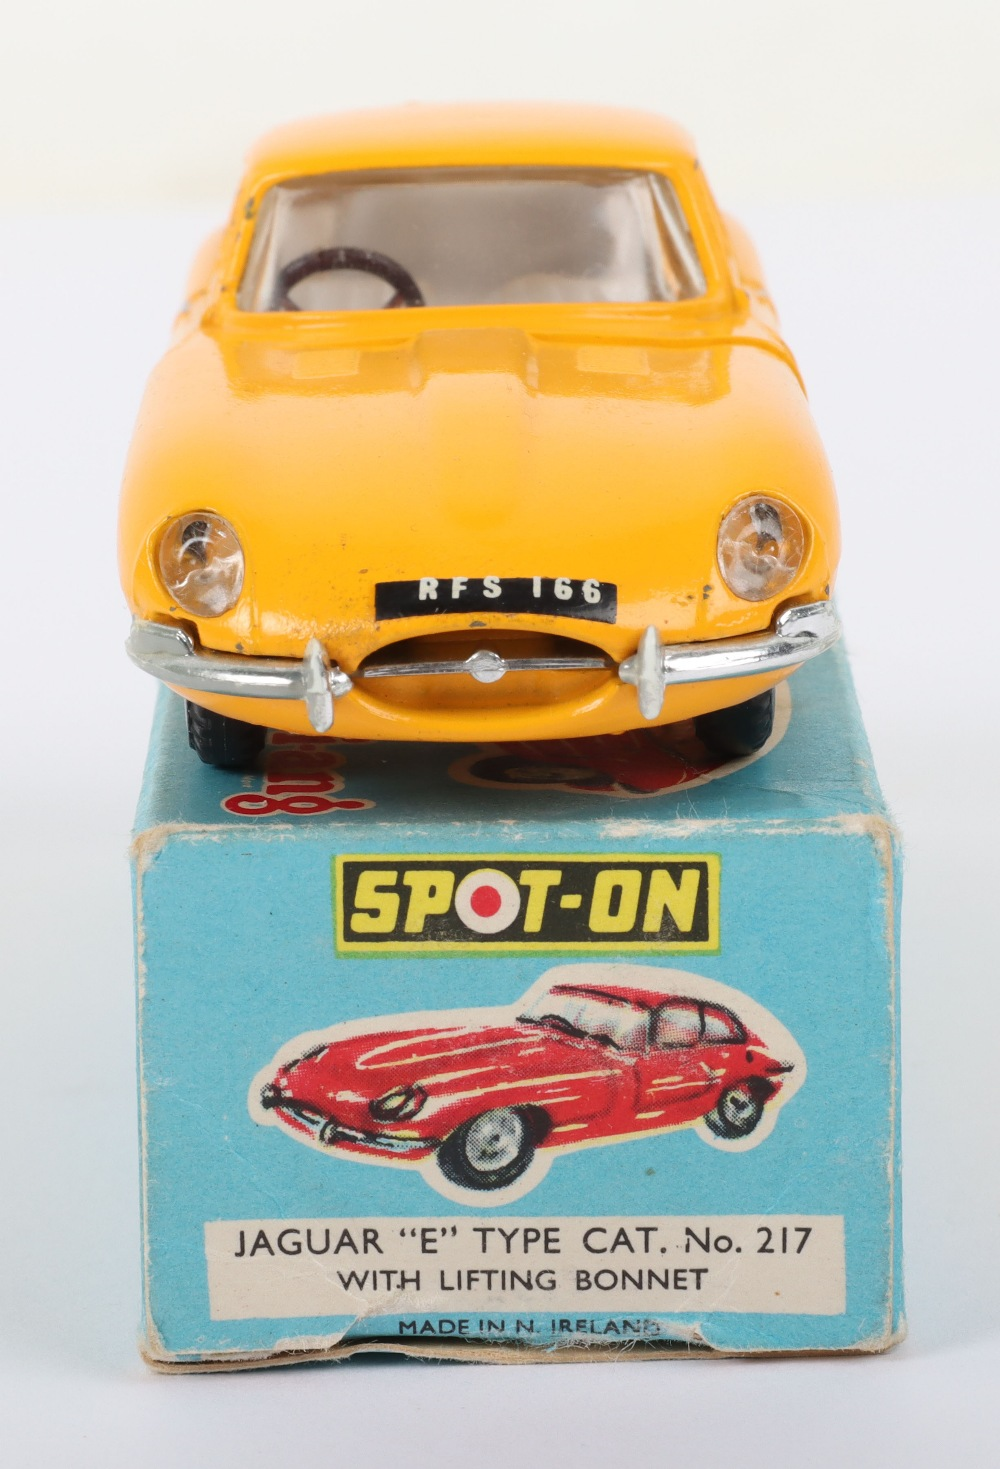 Scarce Triang Spot-On Model 217 Jaguar 'E' Type - Image 4 of 6